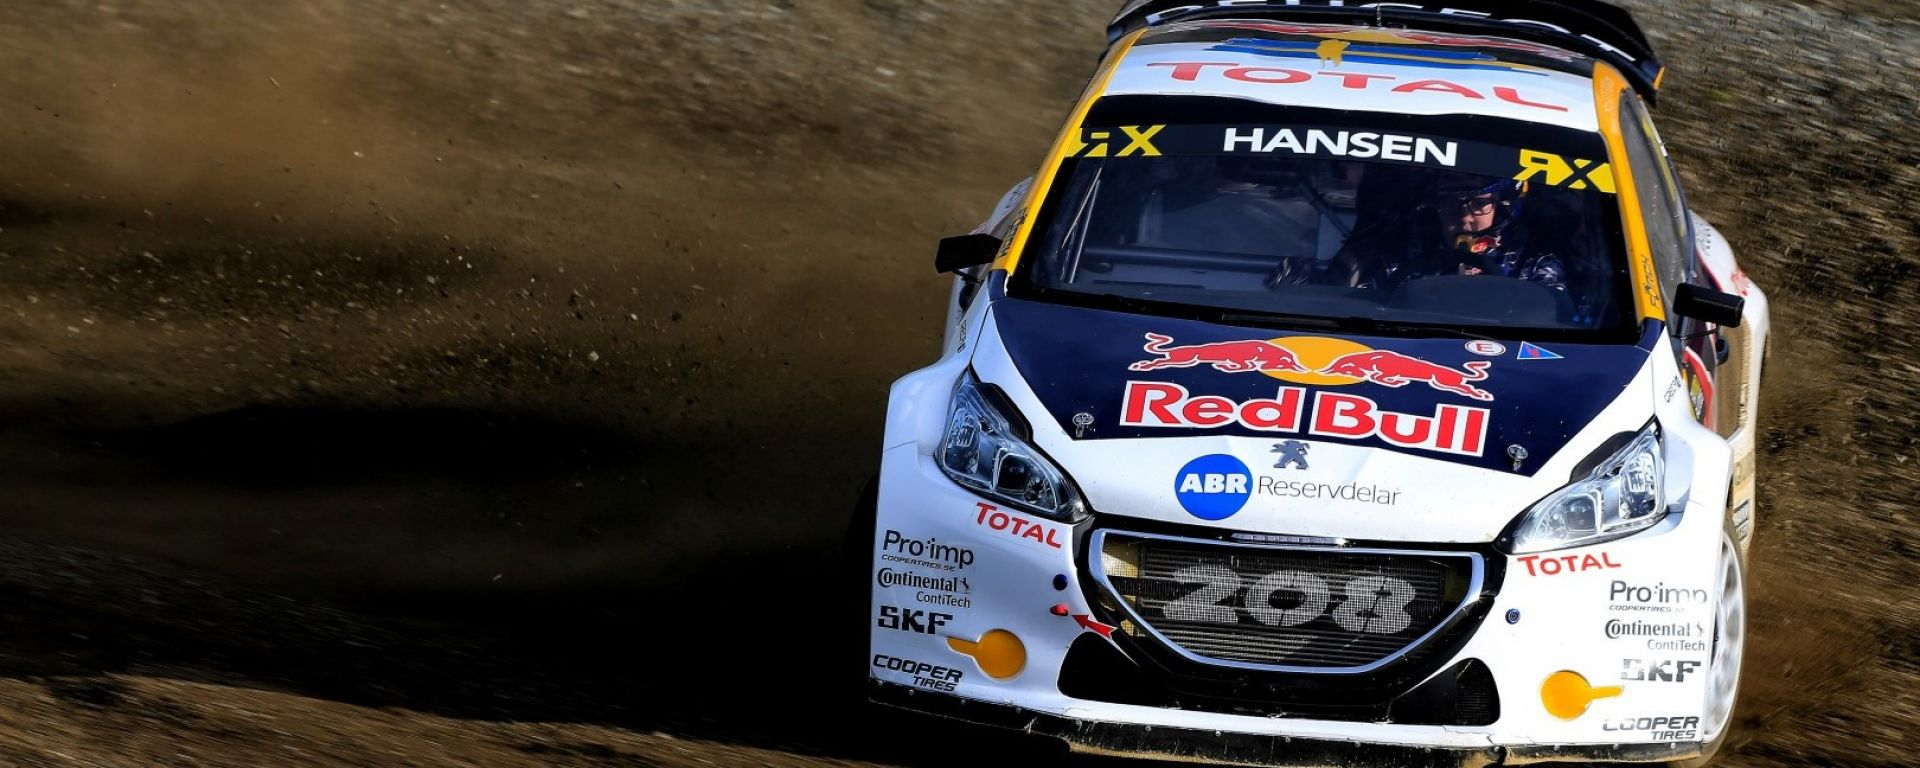 Hansen sulla Peugeot 208 Light - WRX 2017, GP di Hell in Norvegia